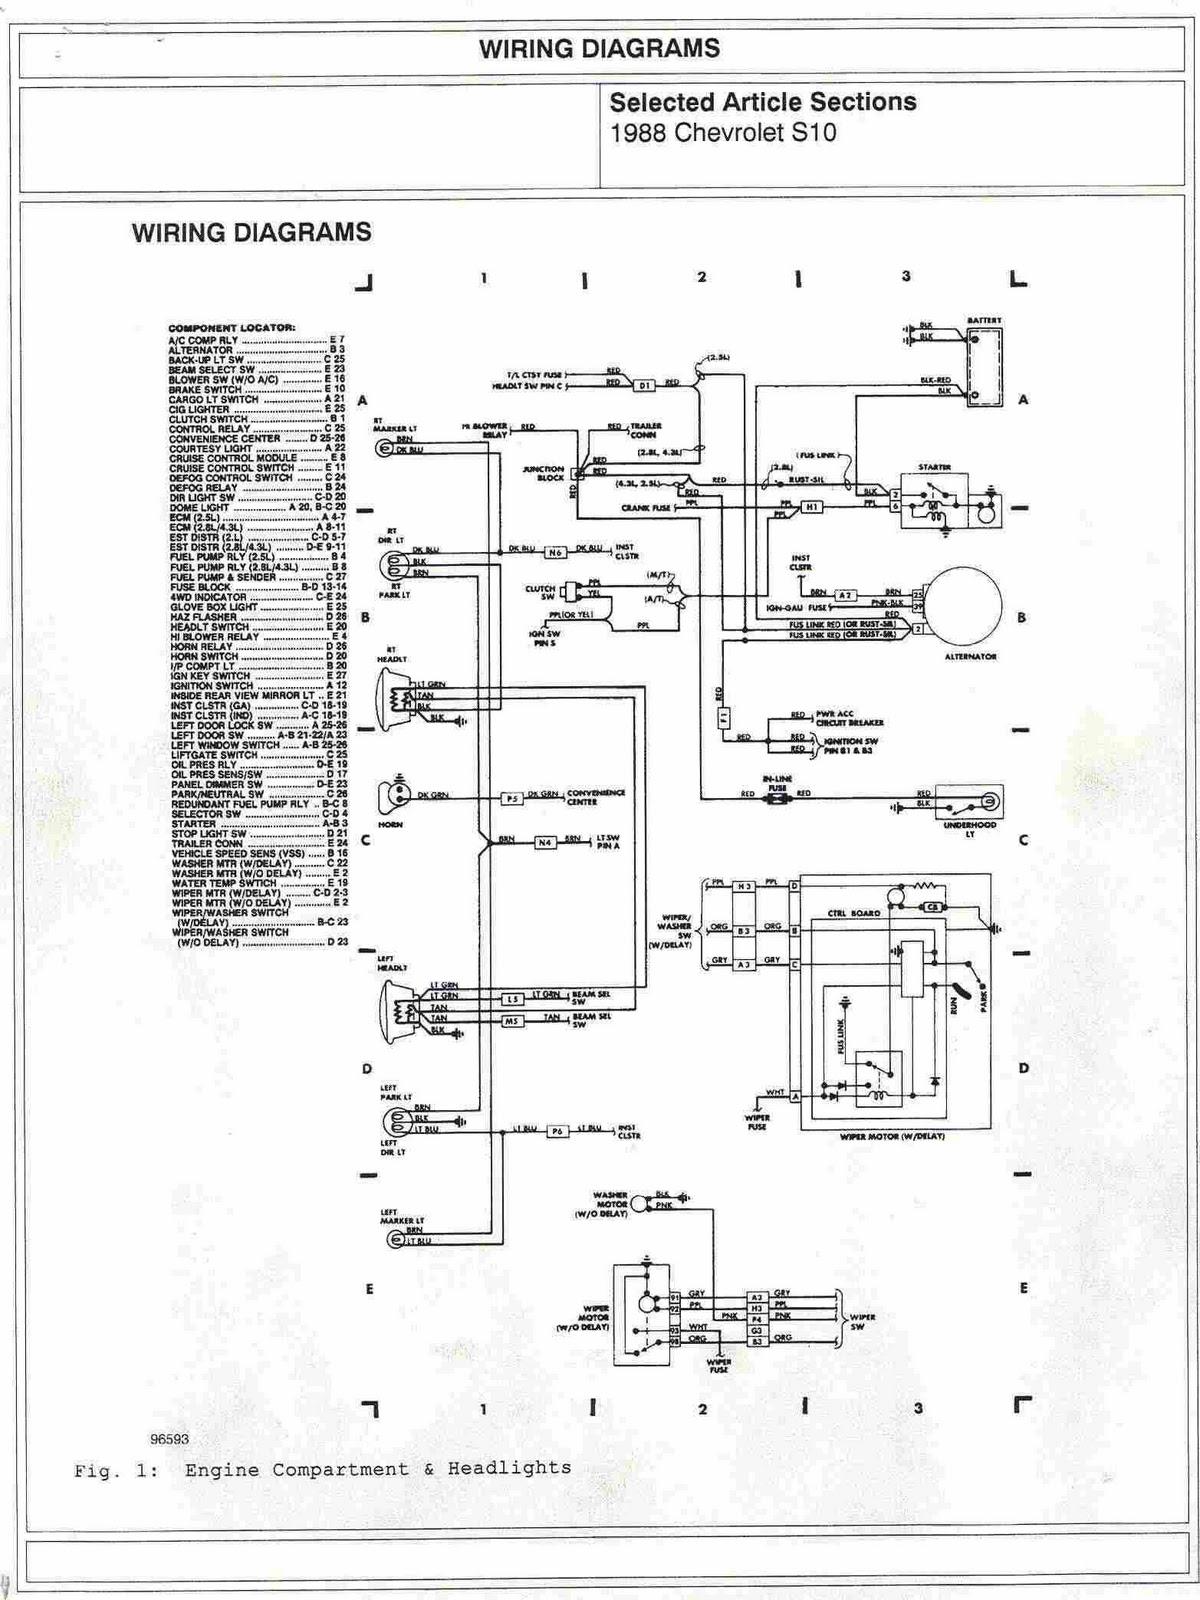 Incredible Audi Mirror Wiring Diagram Today Diagram Data Schema Wiring Cloud Rineaidewilluminateatxorg